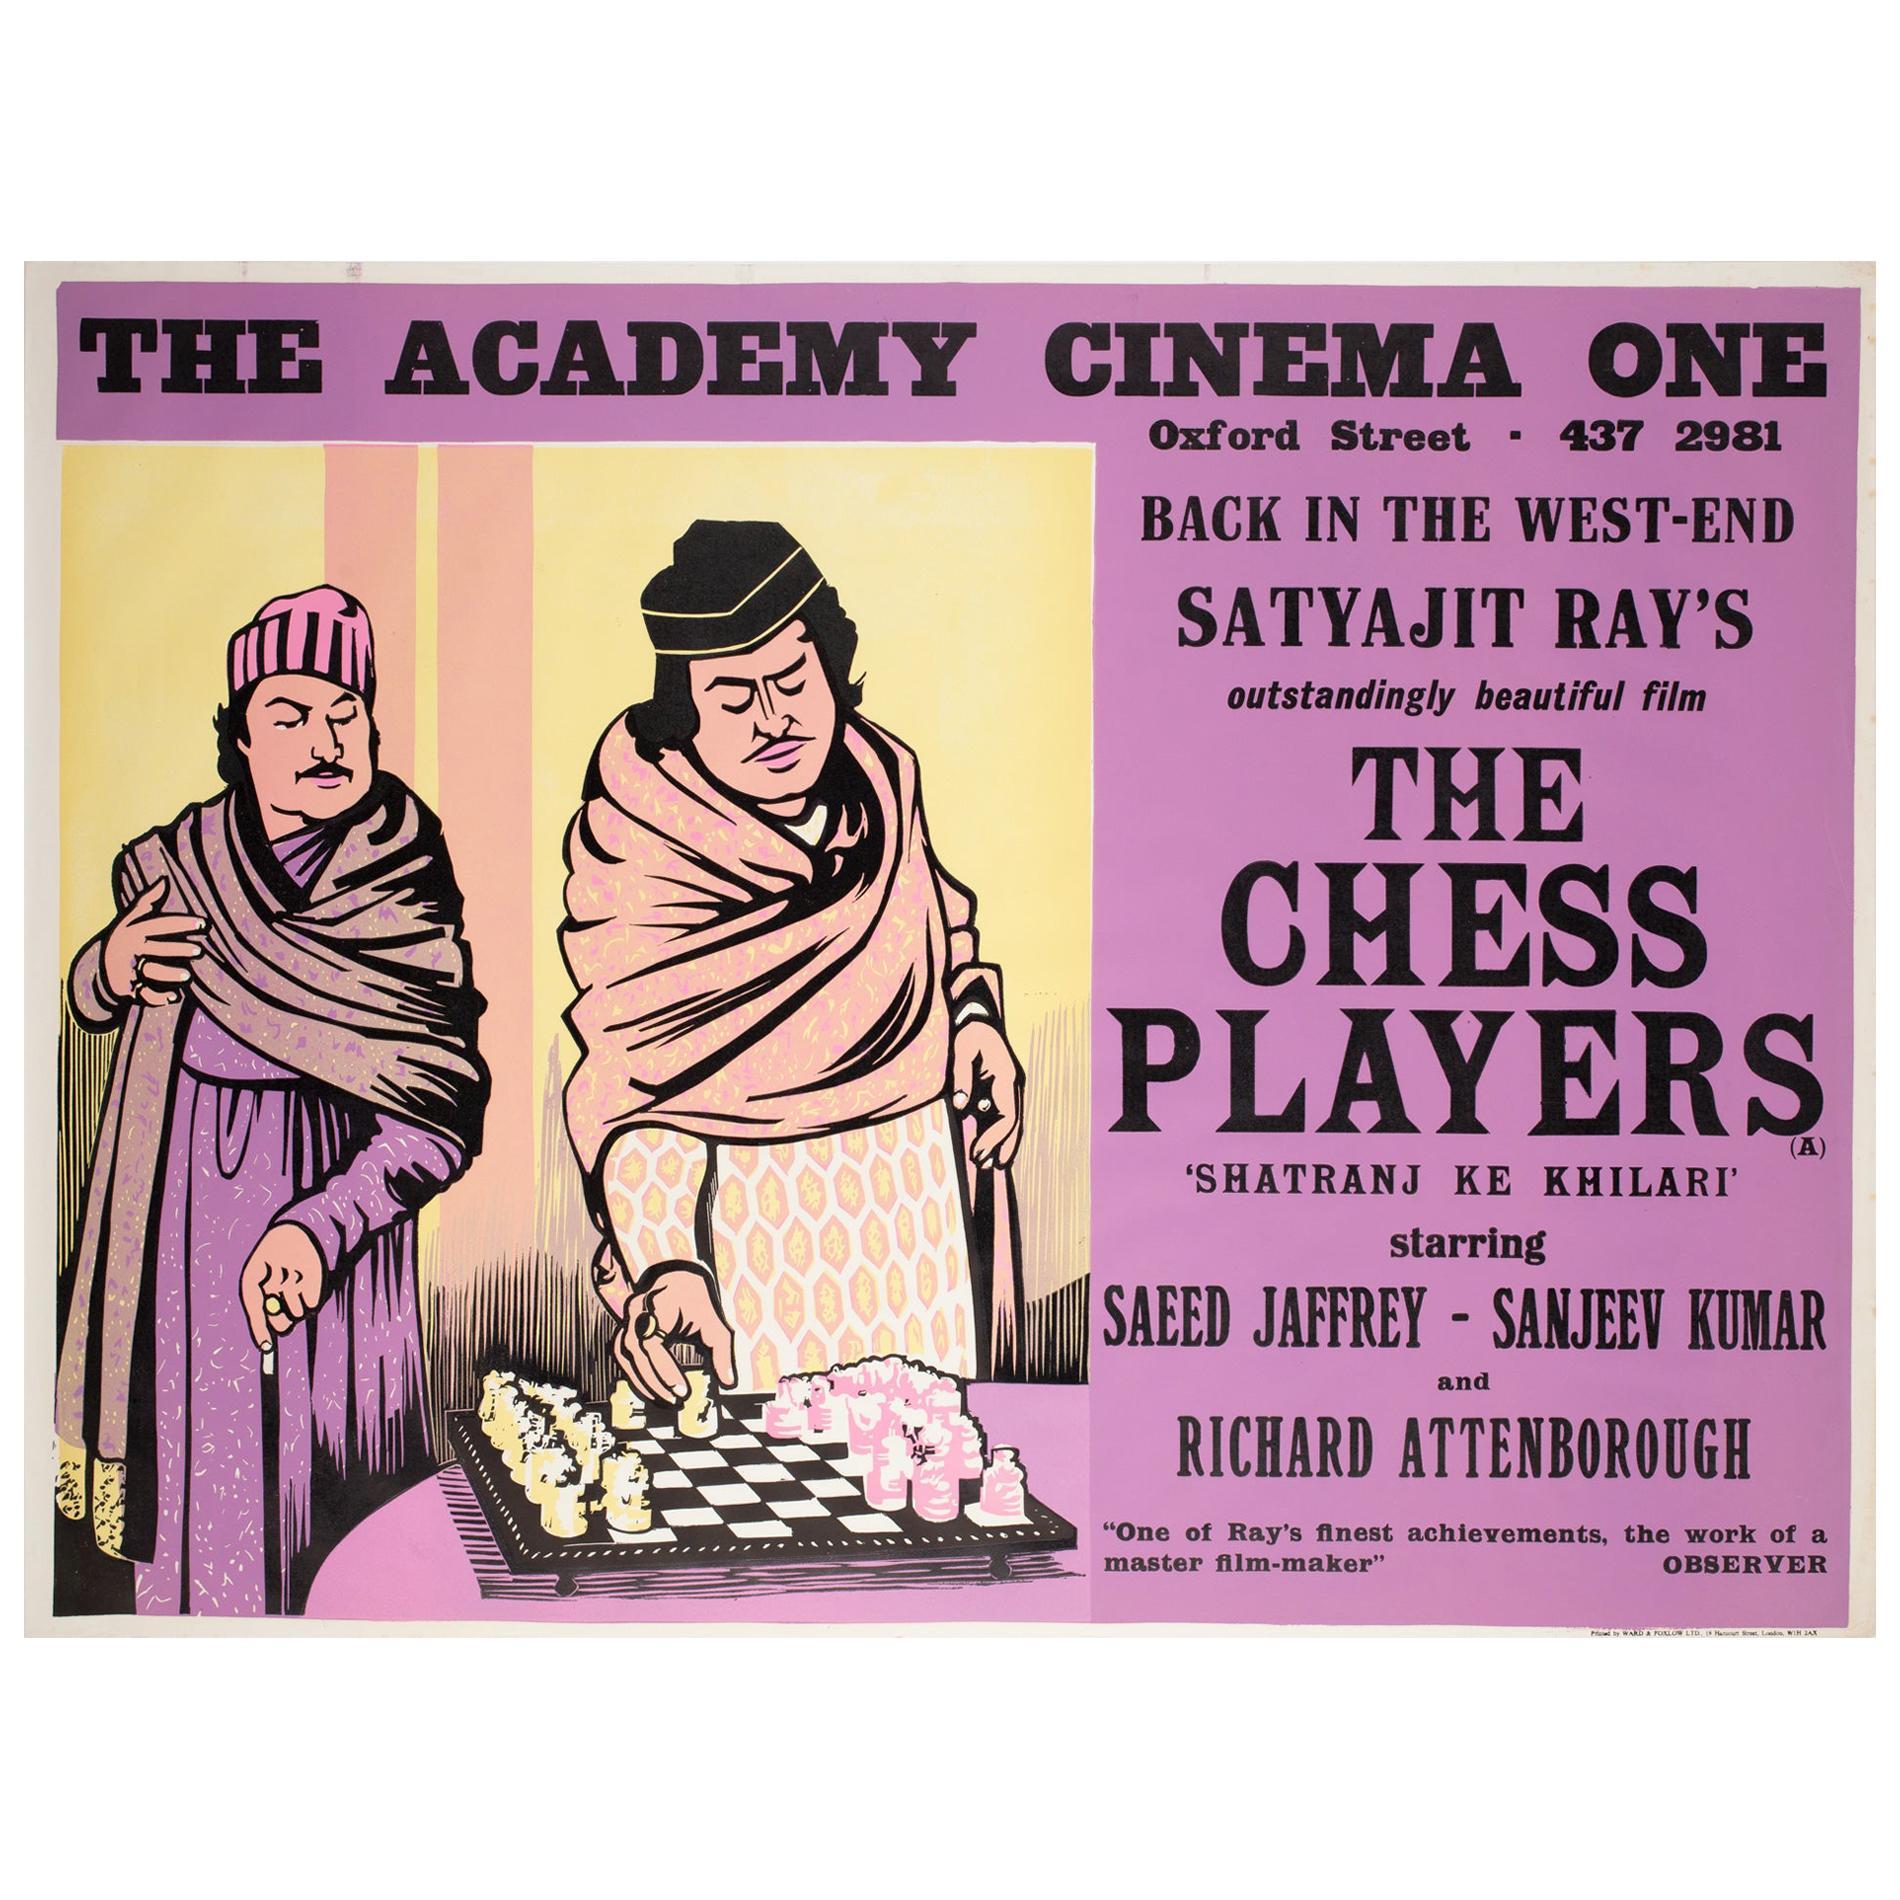 The Chess Players 1970s Academy Cinema London UK Quad Film Poster, Strausfeld